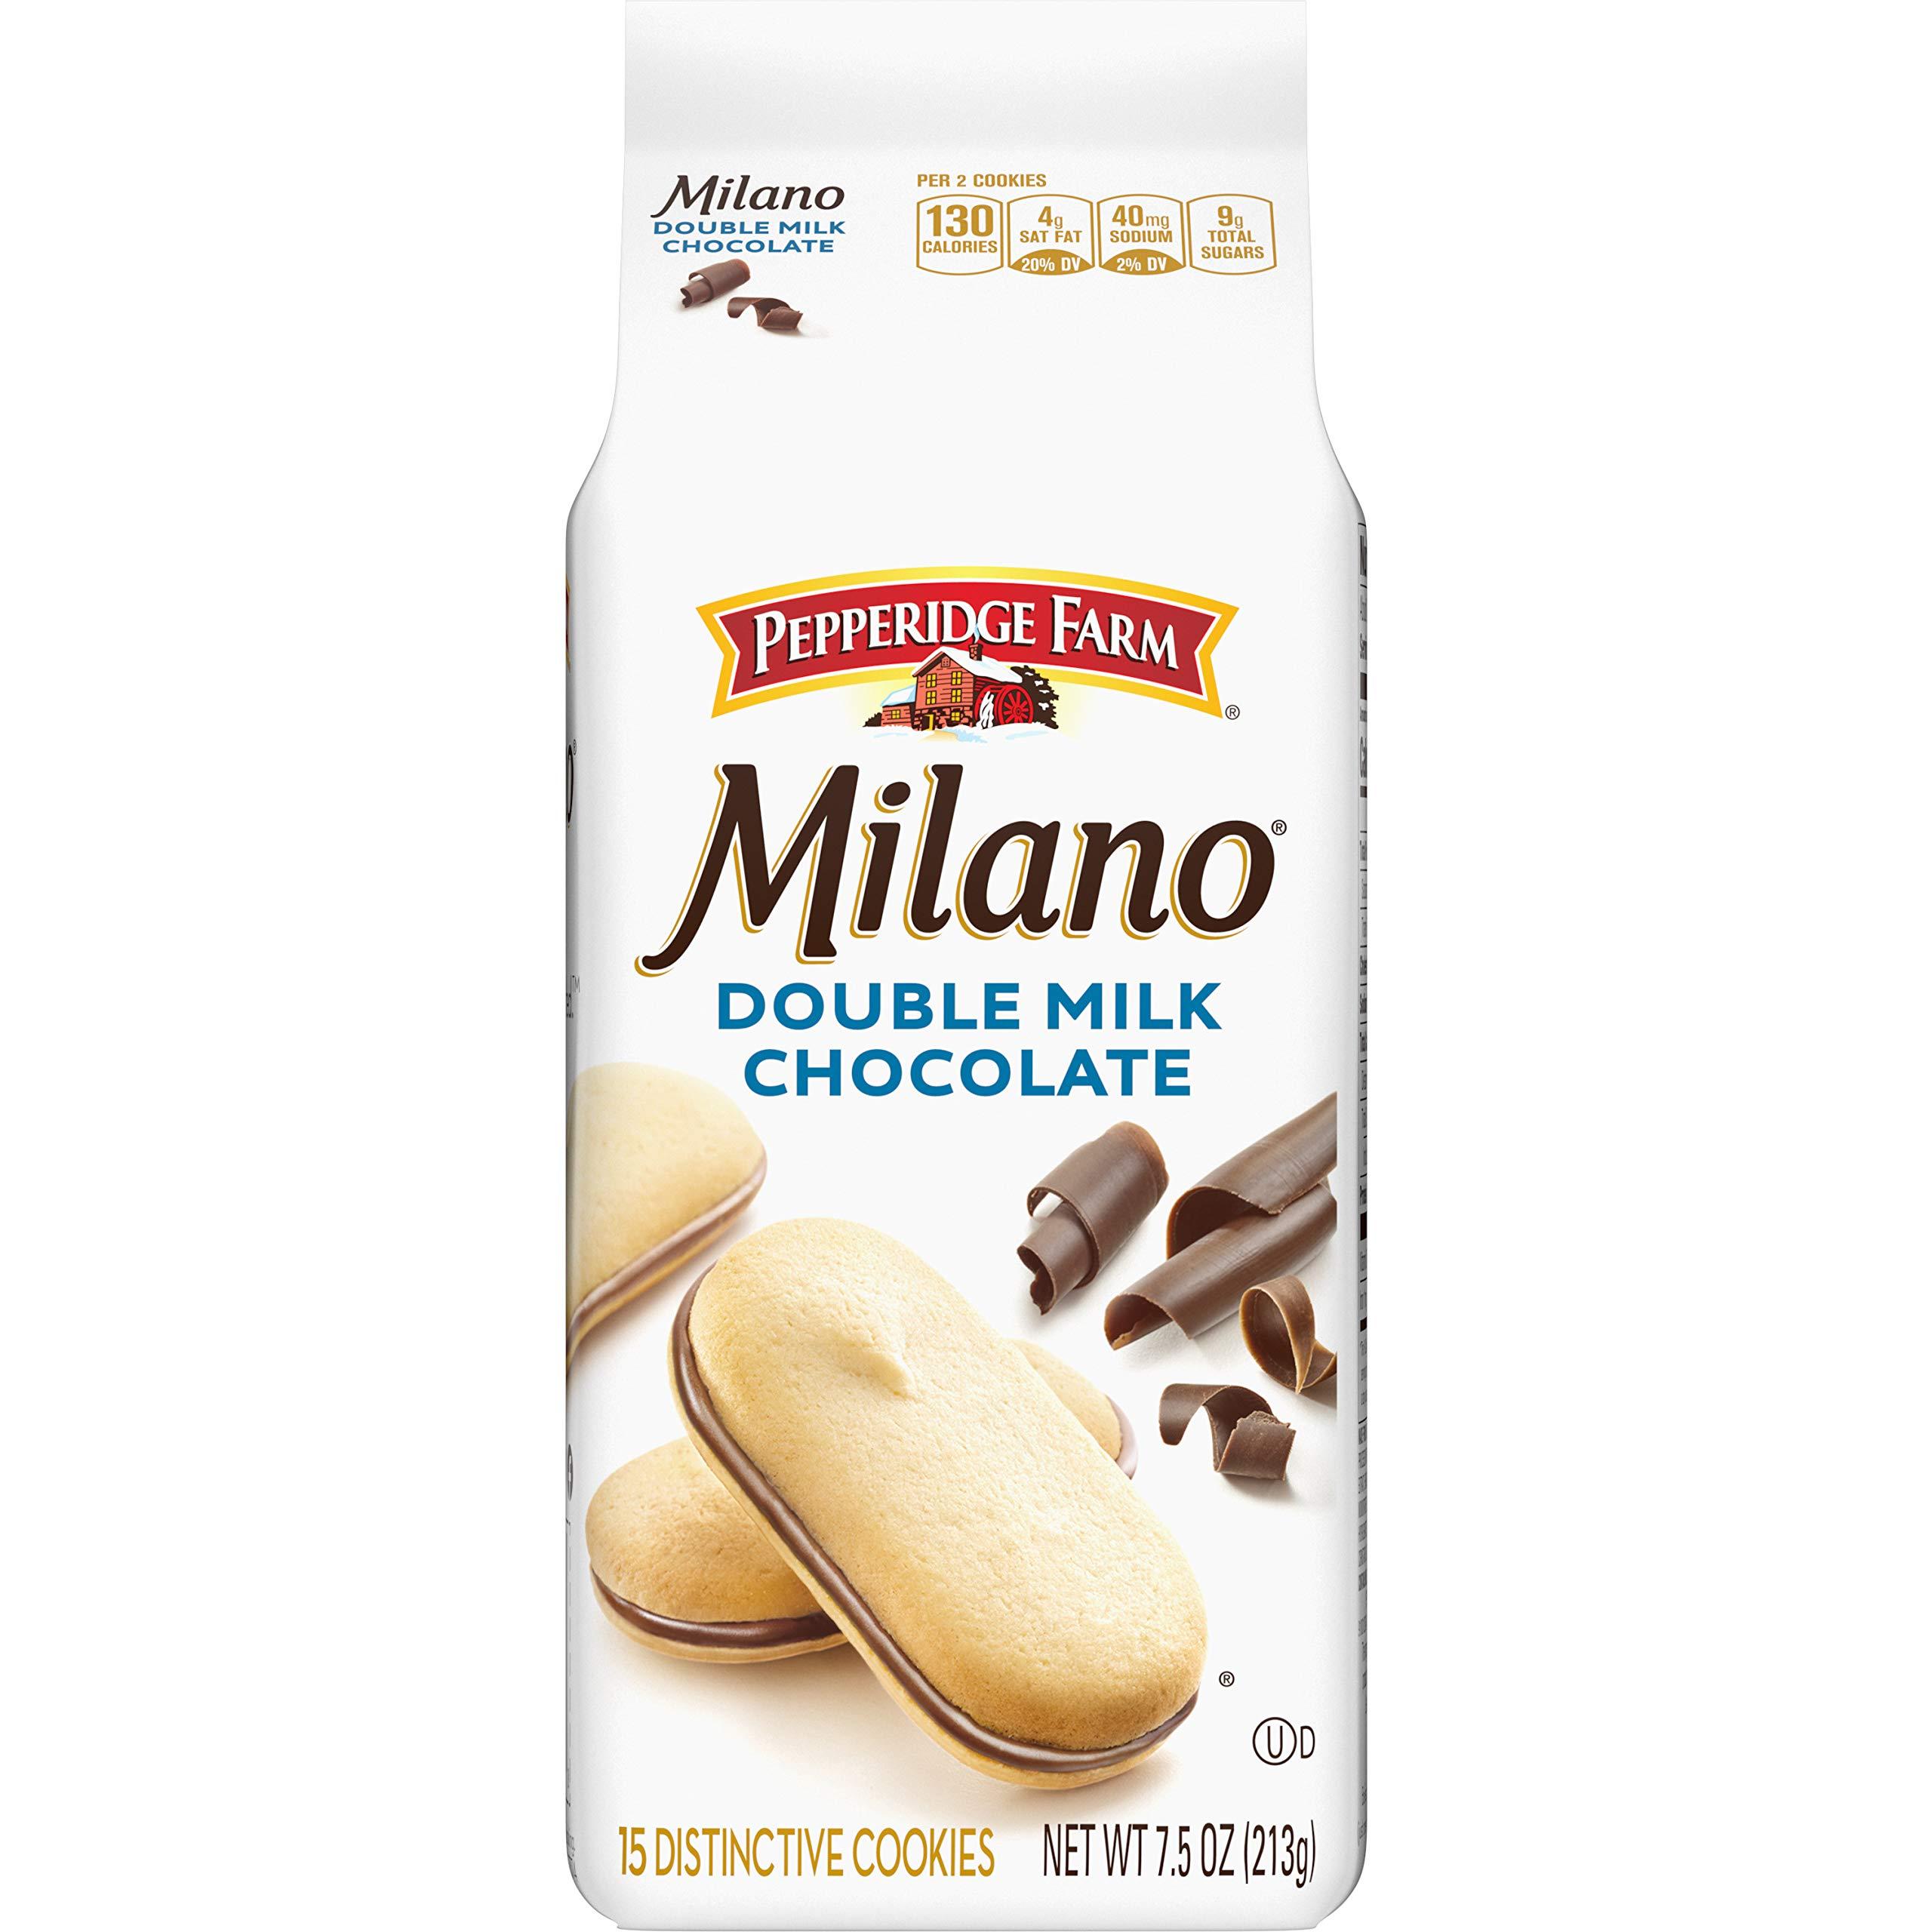 Pepperidge Farm Milano Cookies, Double Milk Chocolate, 7.5 oz. Bag